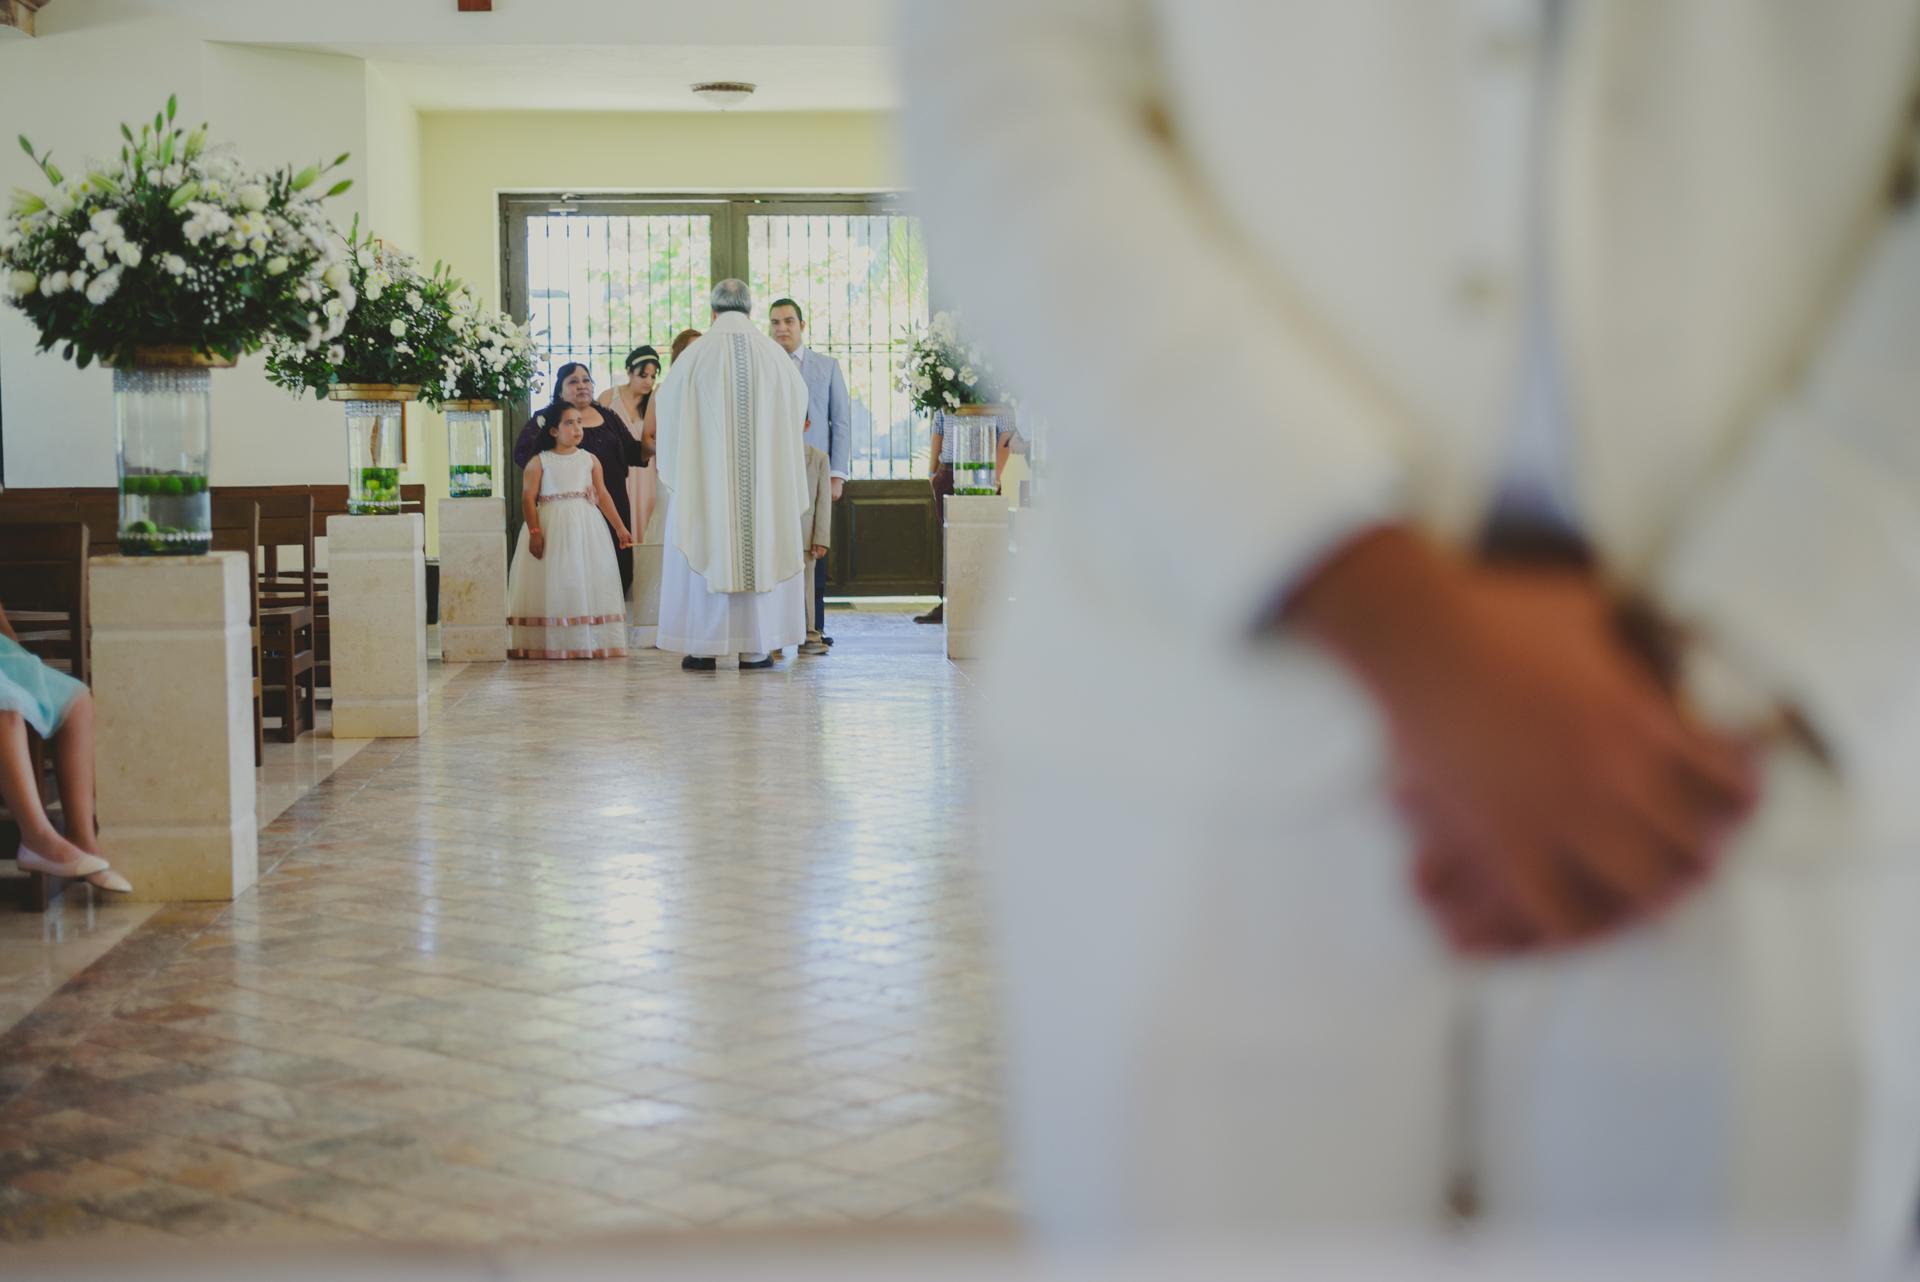 Wedding N&M BLOG luishoudin.com (35 de 174)